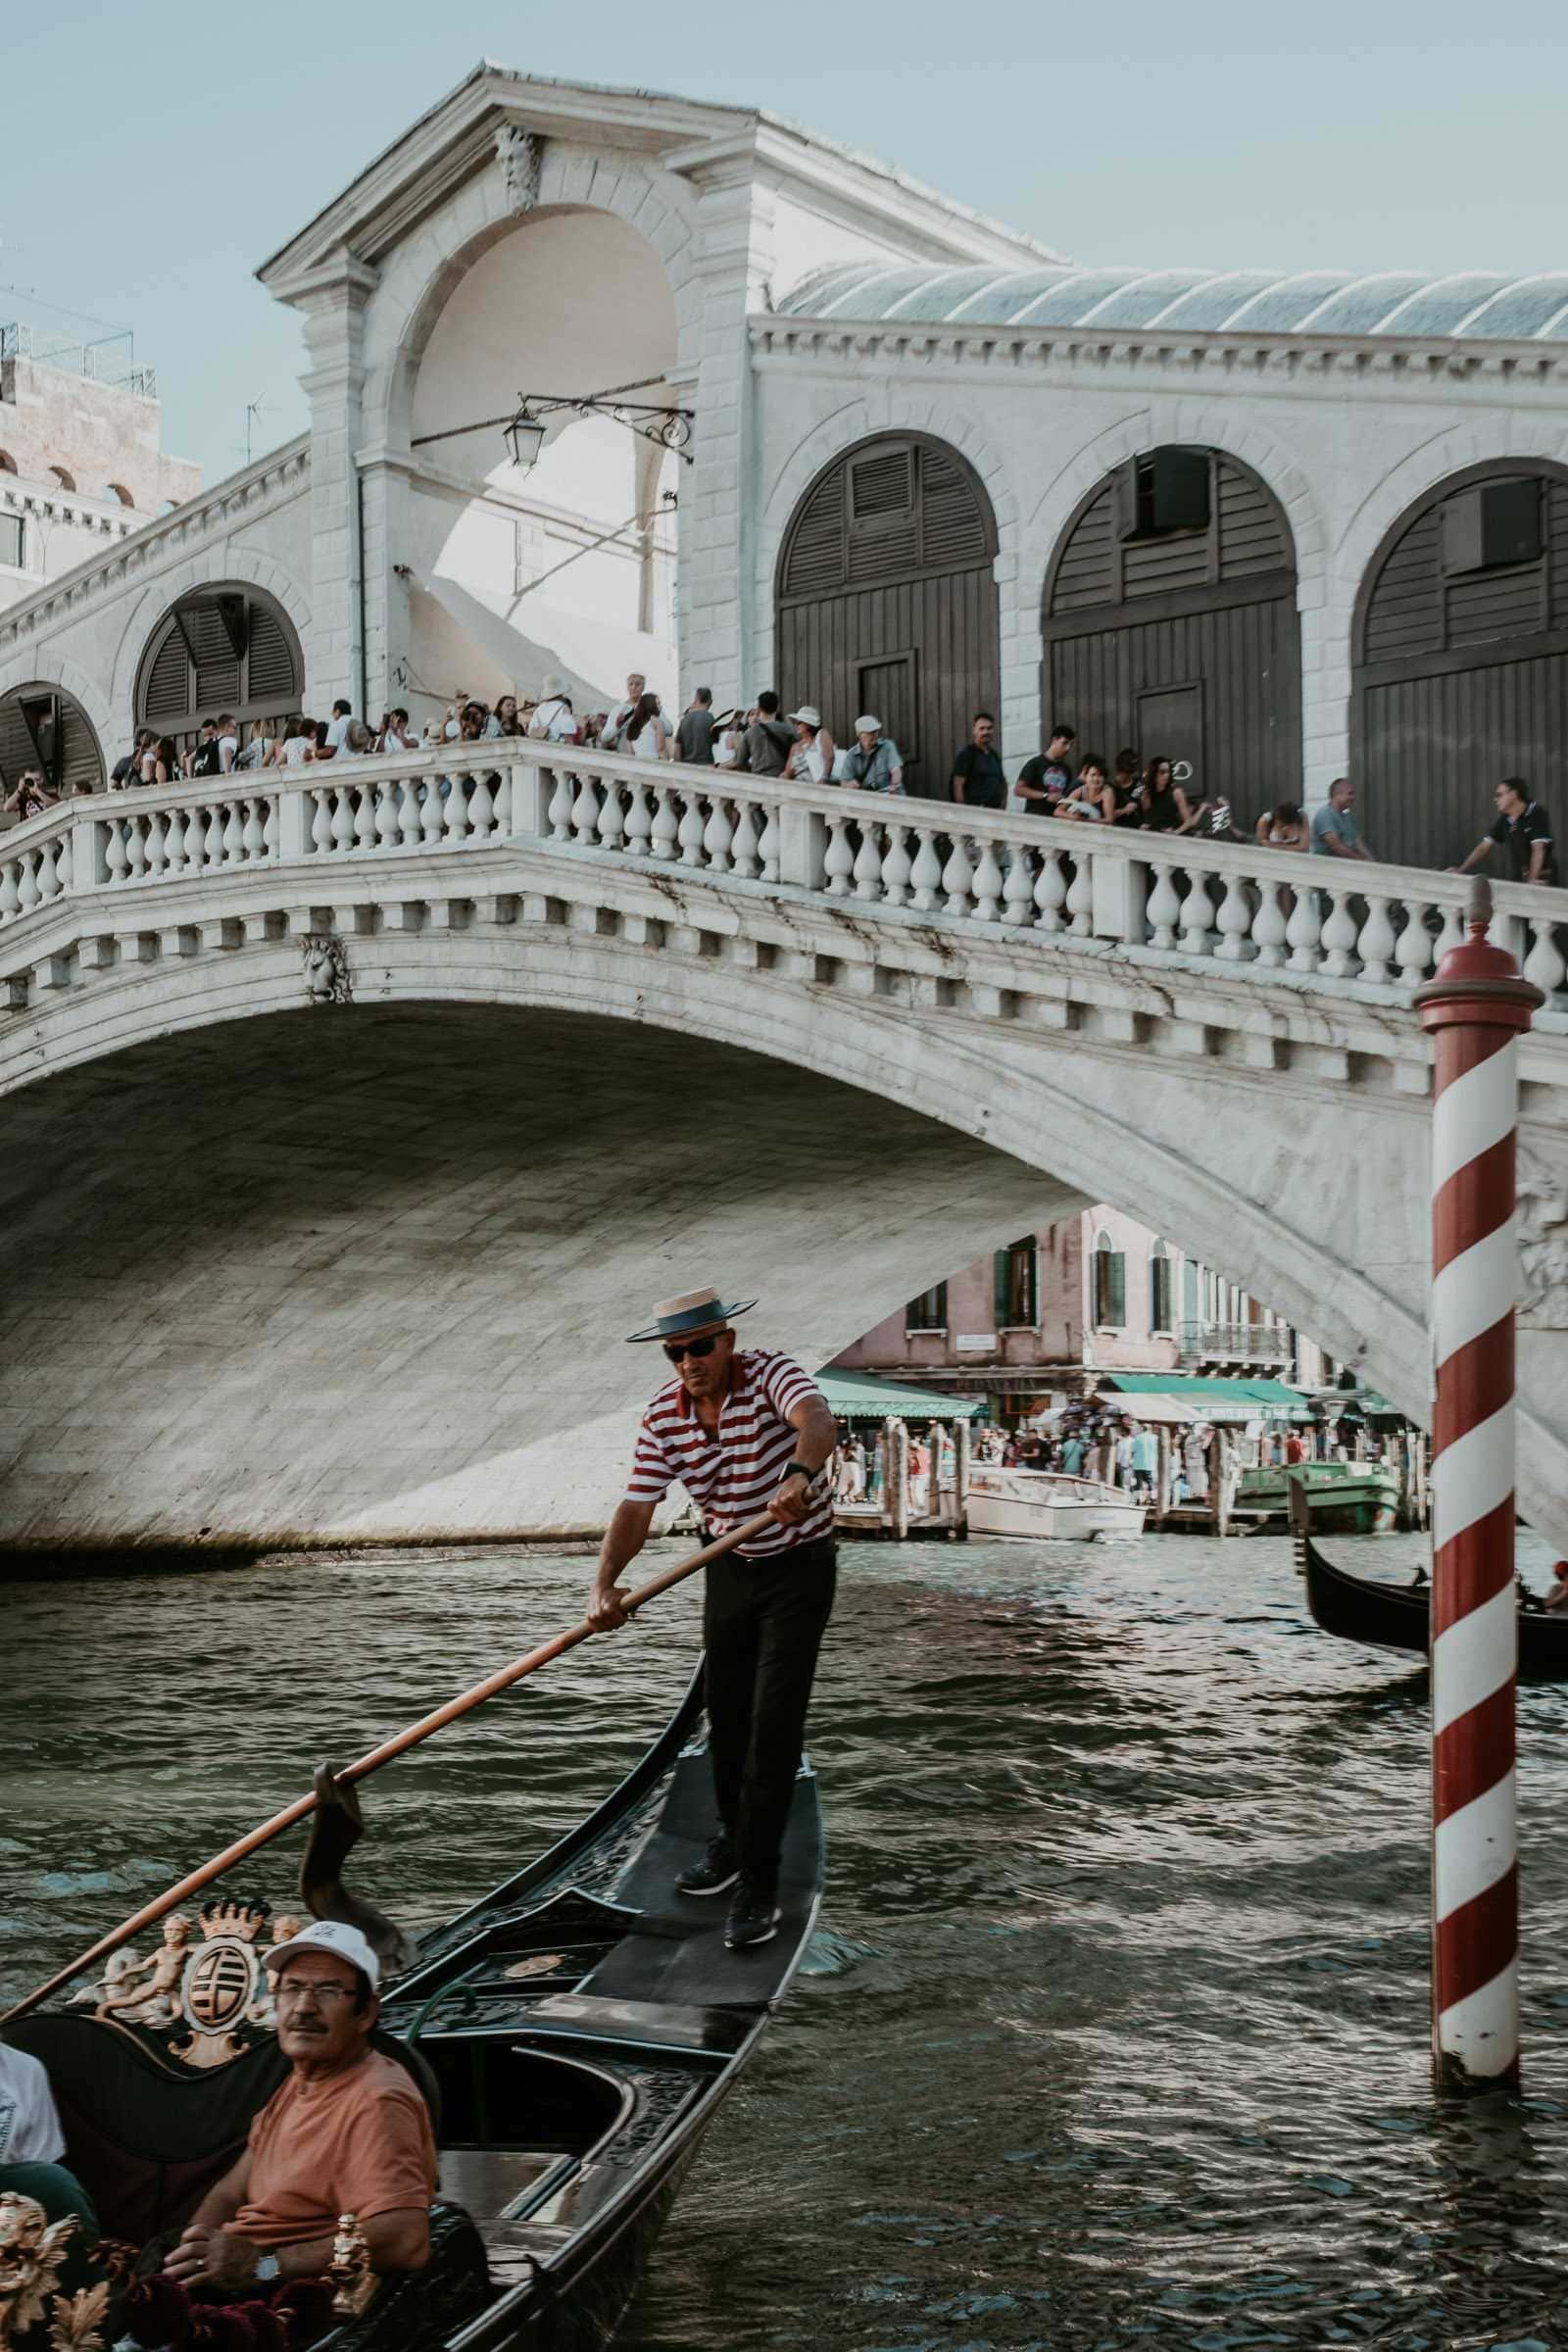 Gondoliere Gondel Rialtobrücke